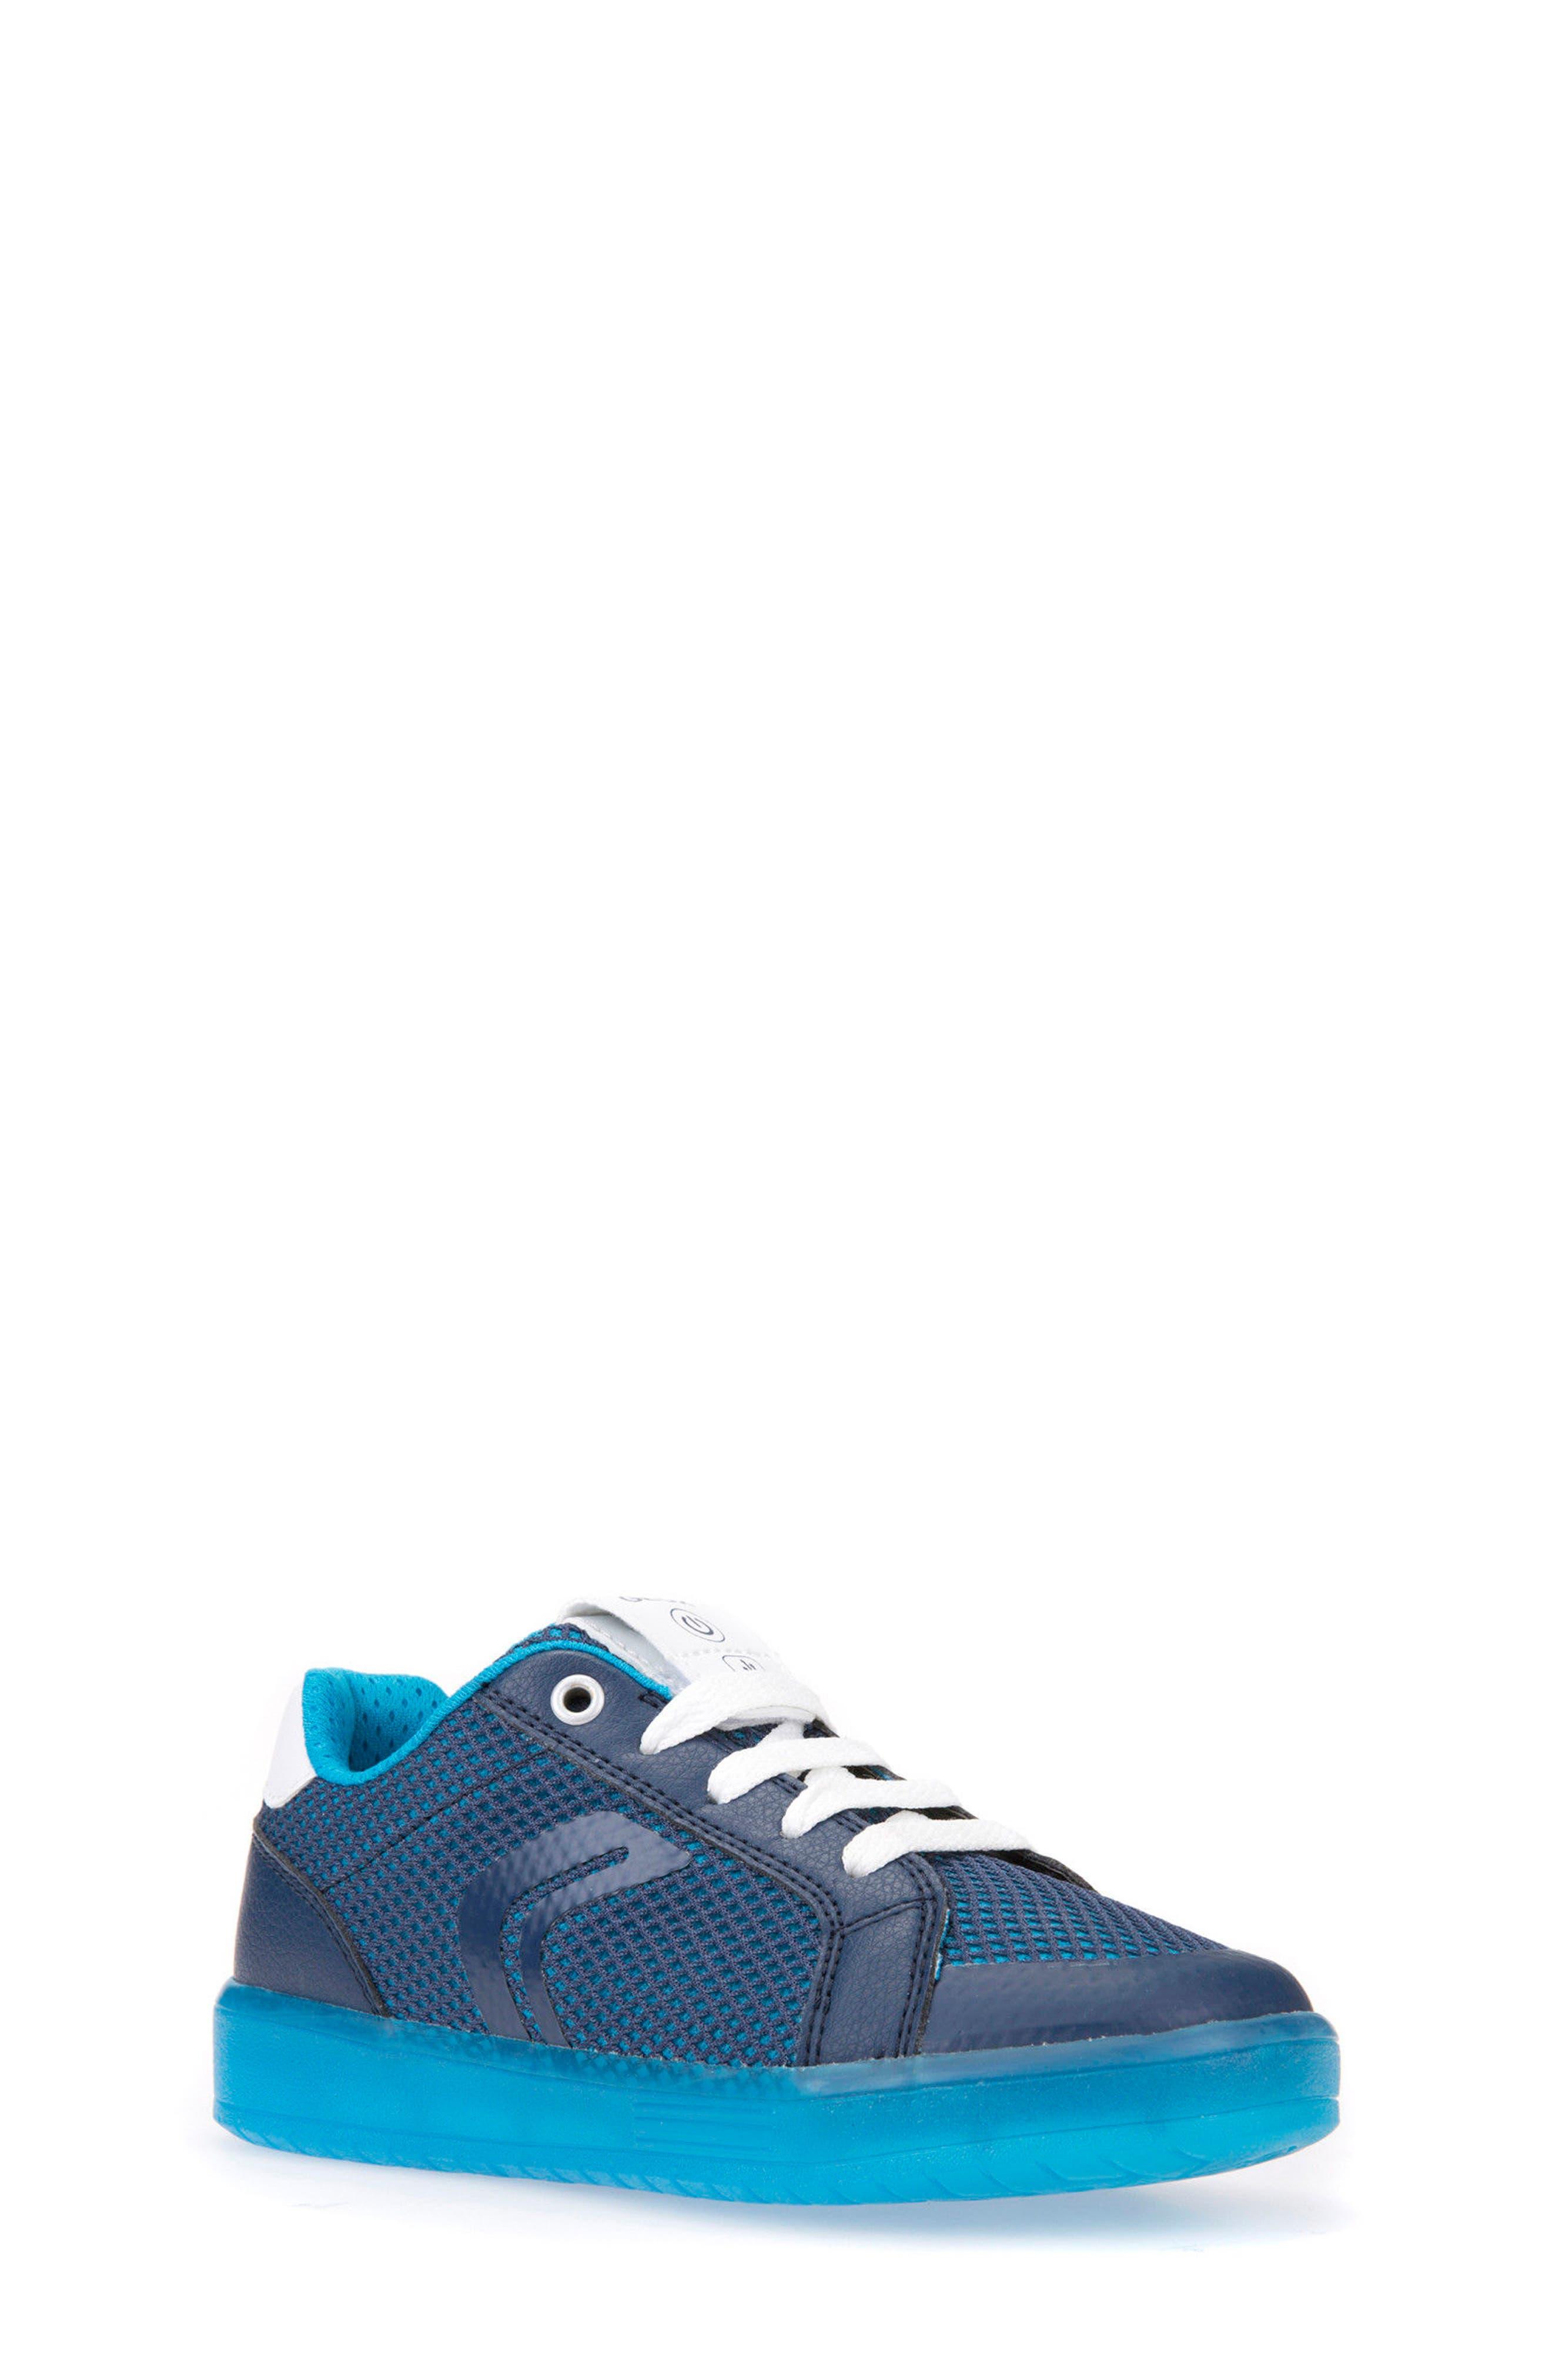 Kommodor Light-Up Mesh Sneaker,                             Main thumbnail 1, color,                             Navy/ Light Blue